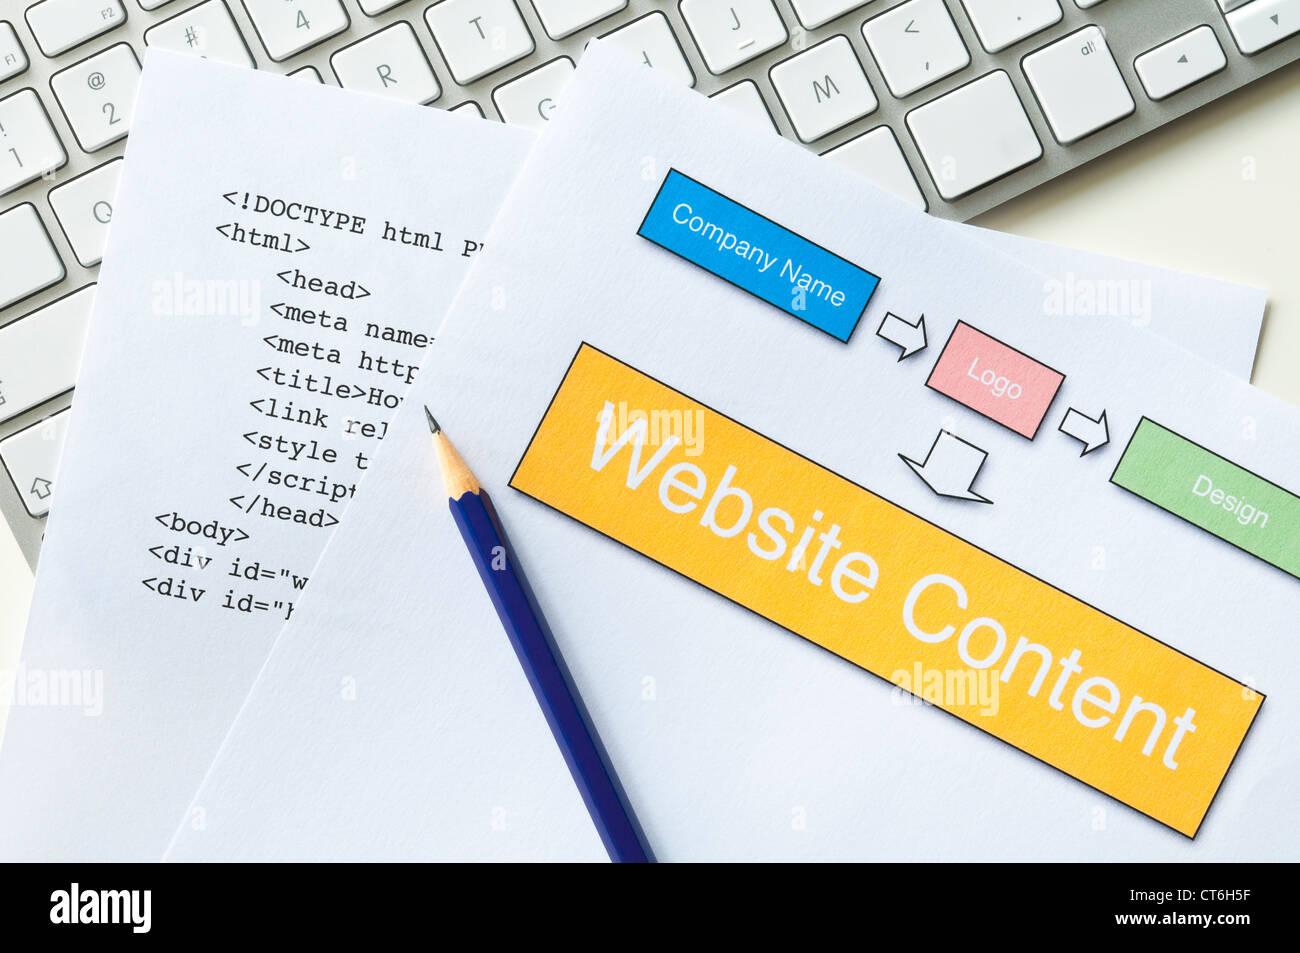 Html Website Design Project